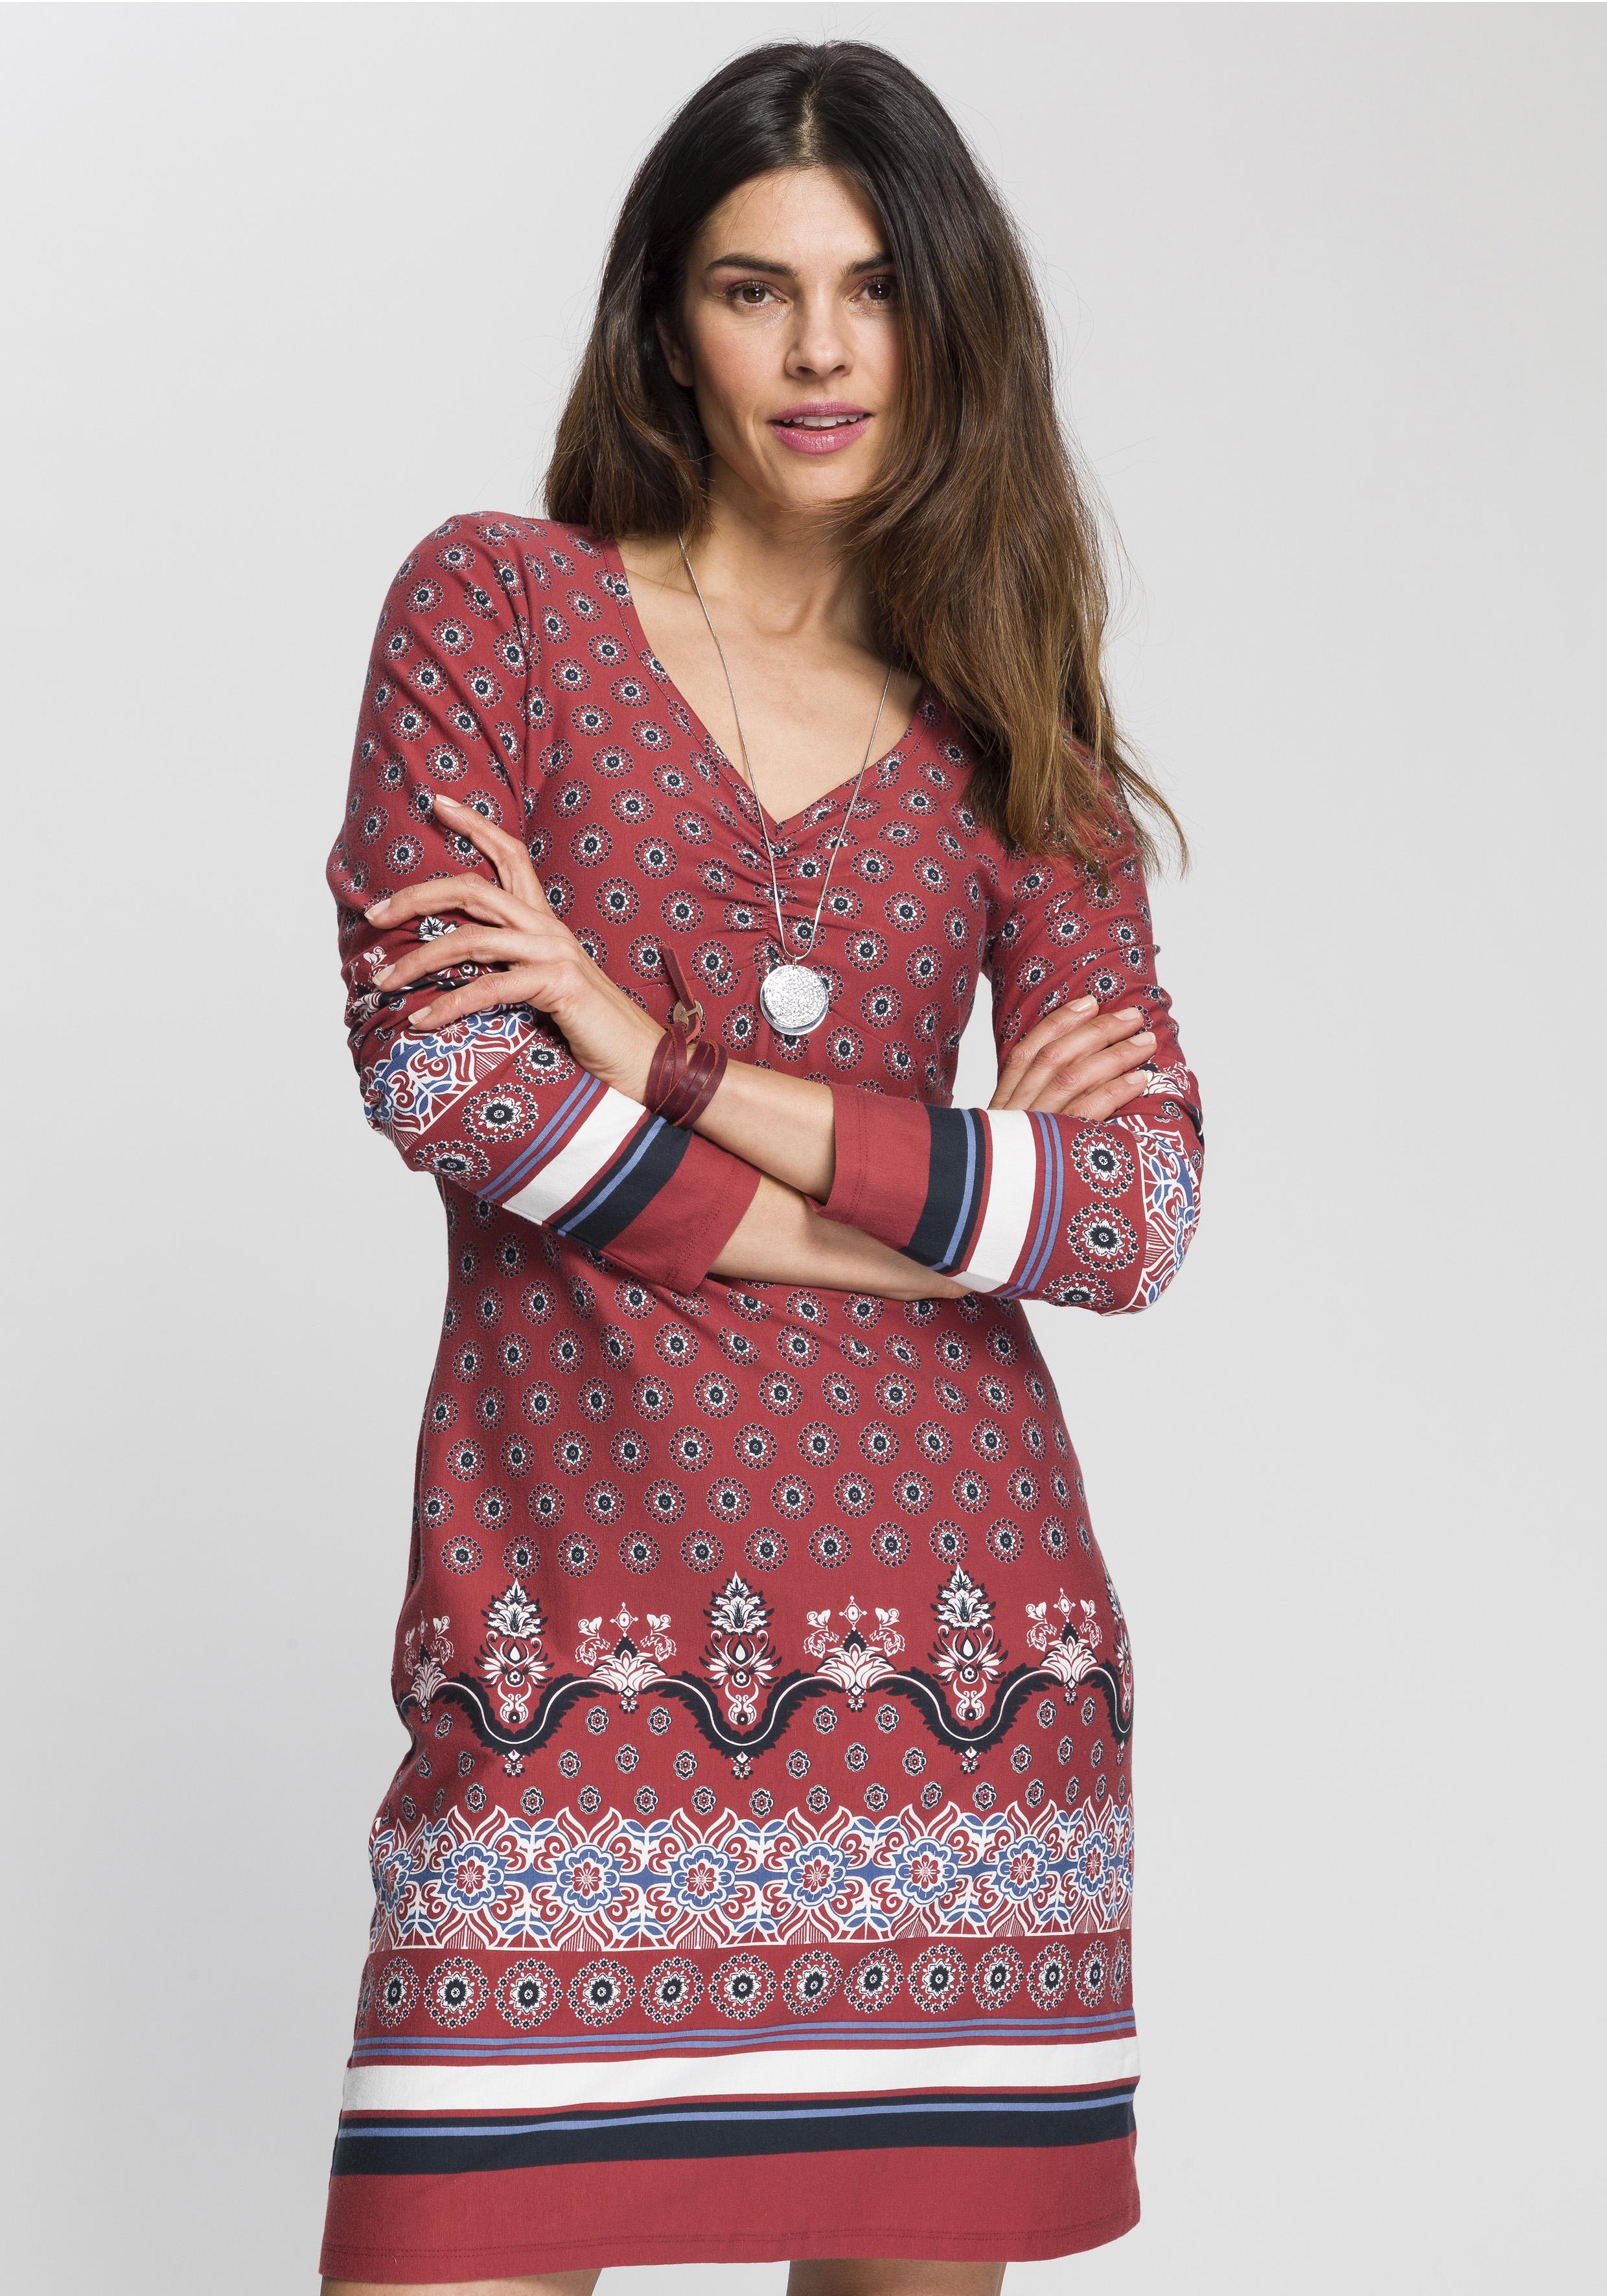 boysen's -  Jerseykleid, mit ornamentalem Alloverprint